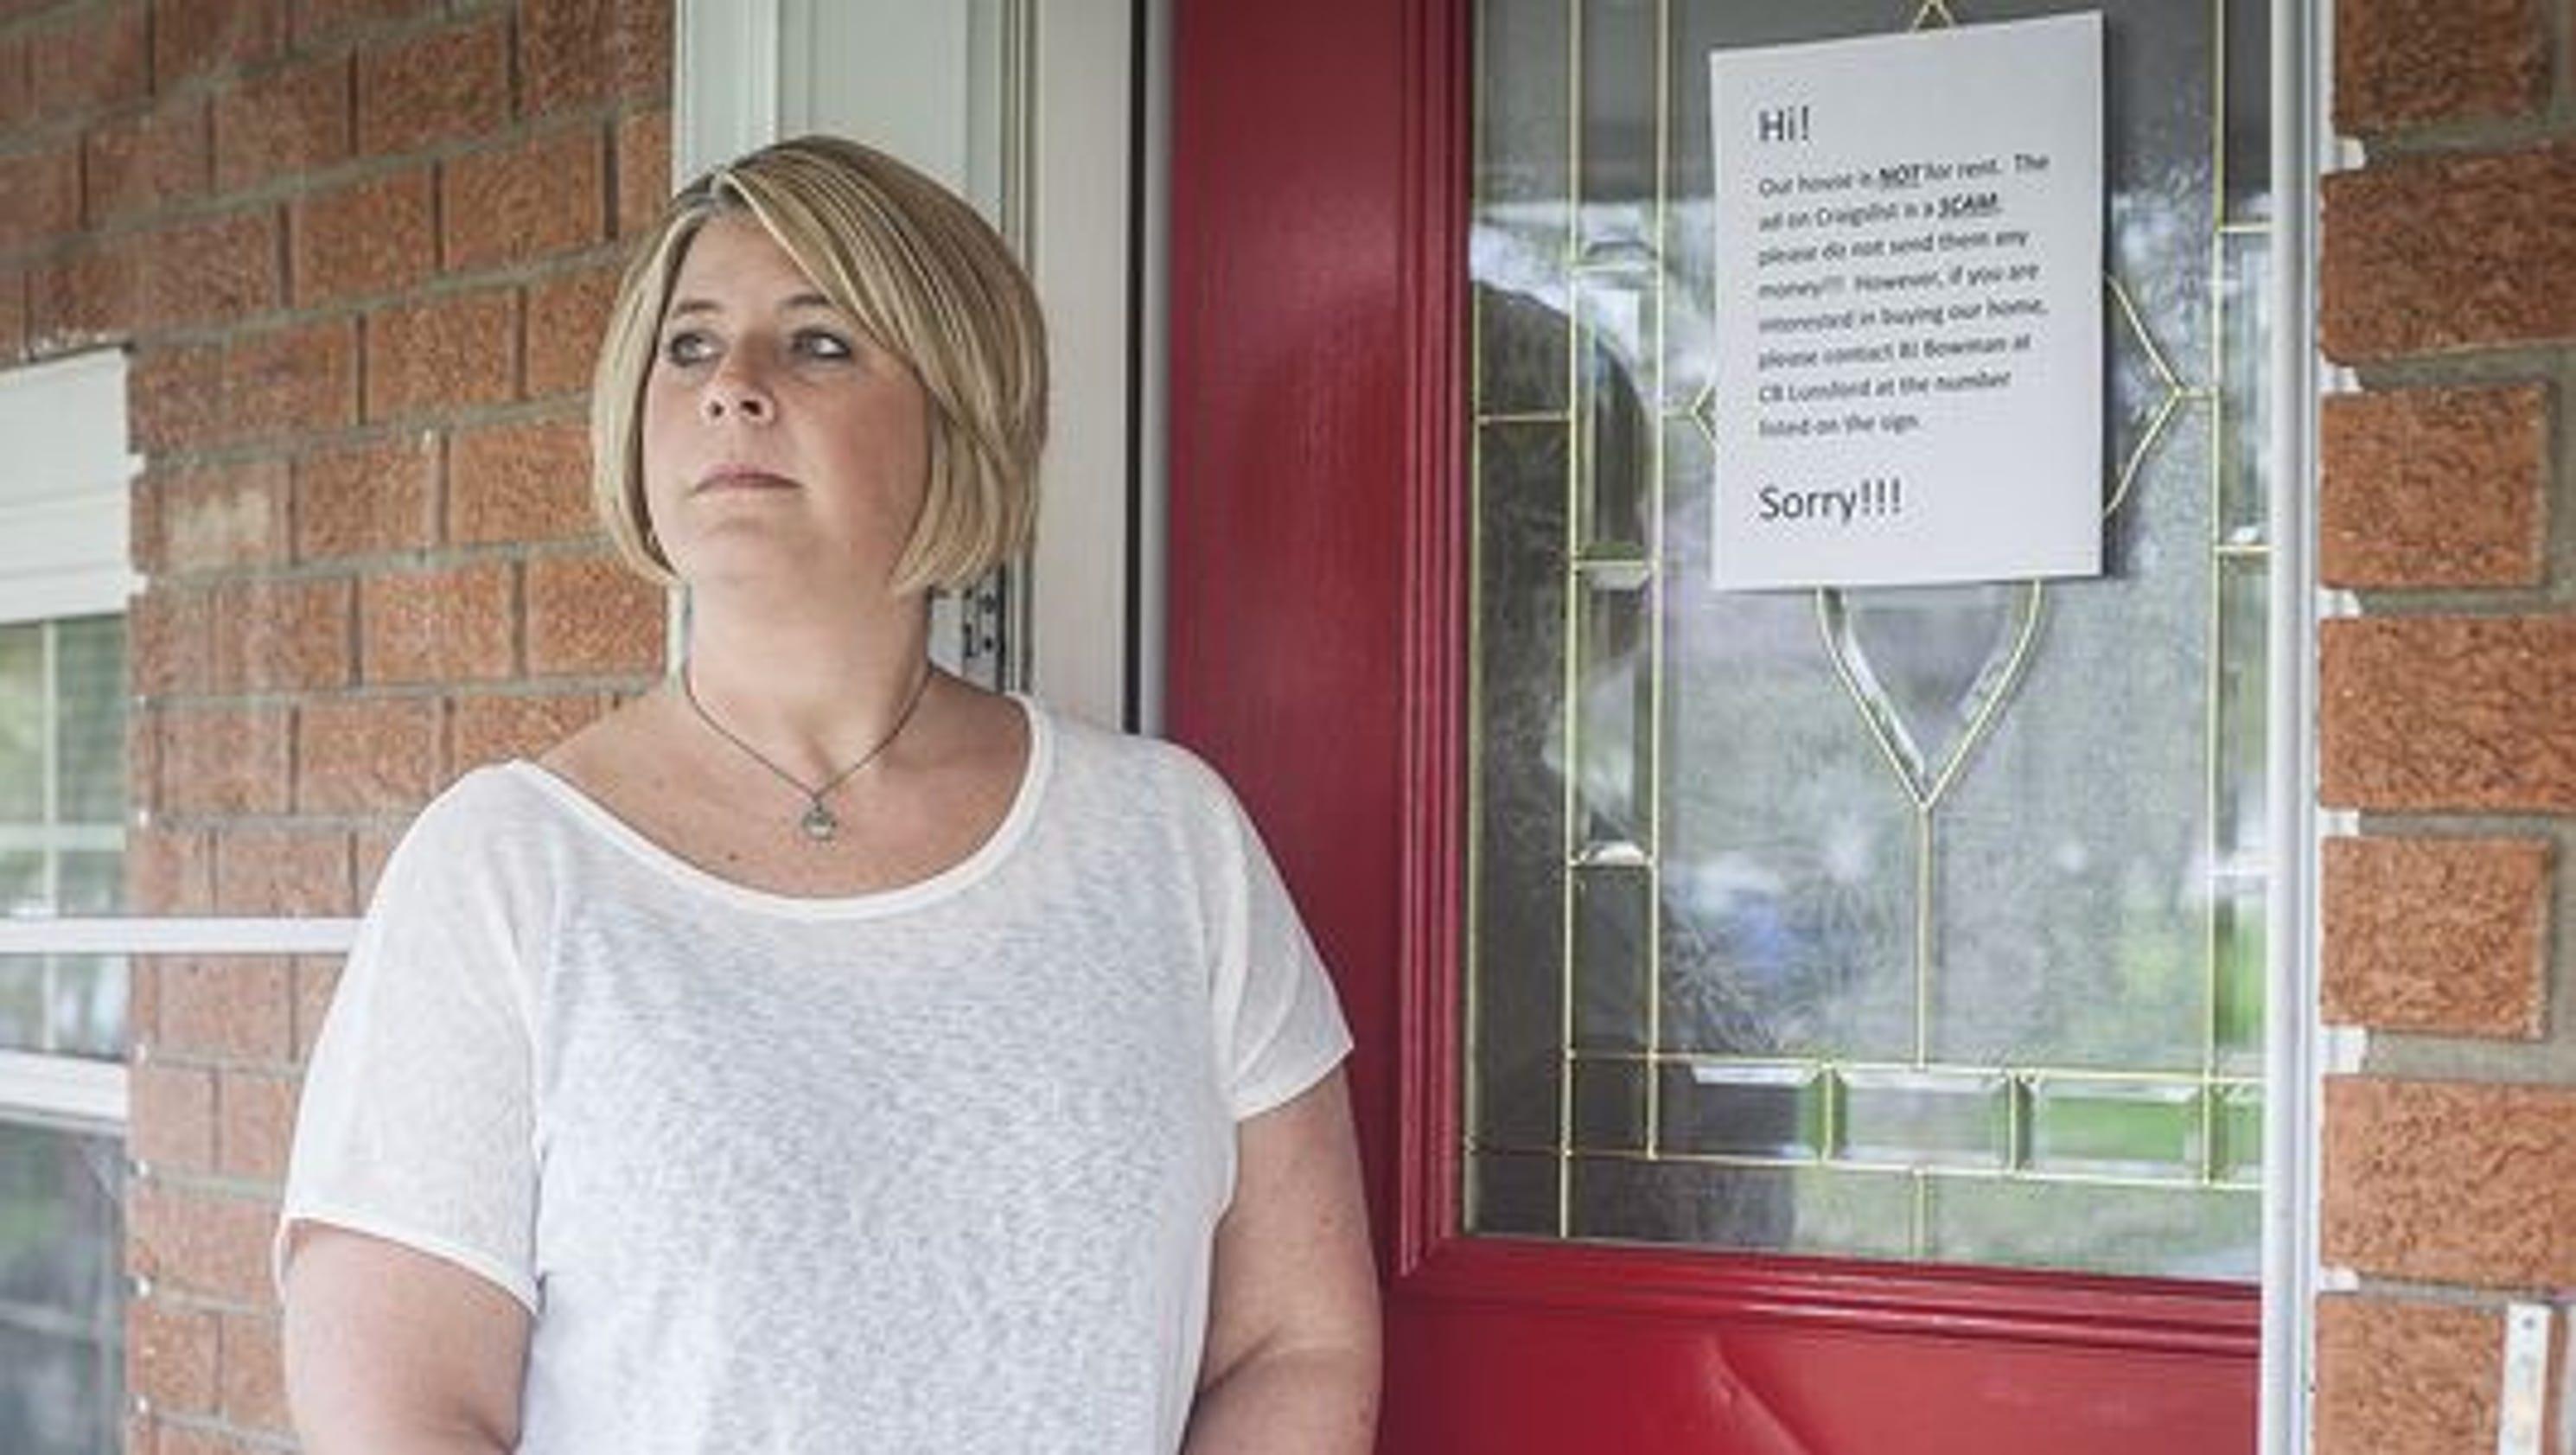 Craigslist house rental scam hits Indiana